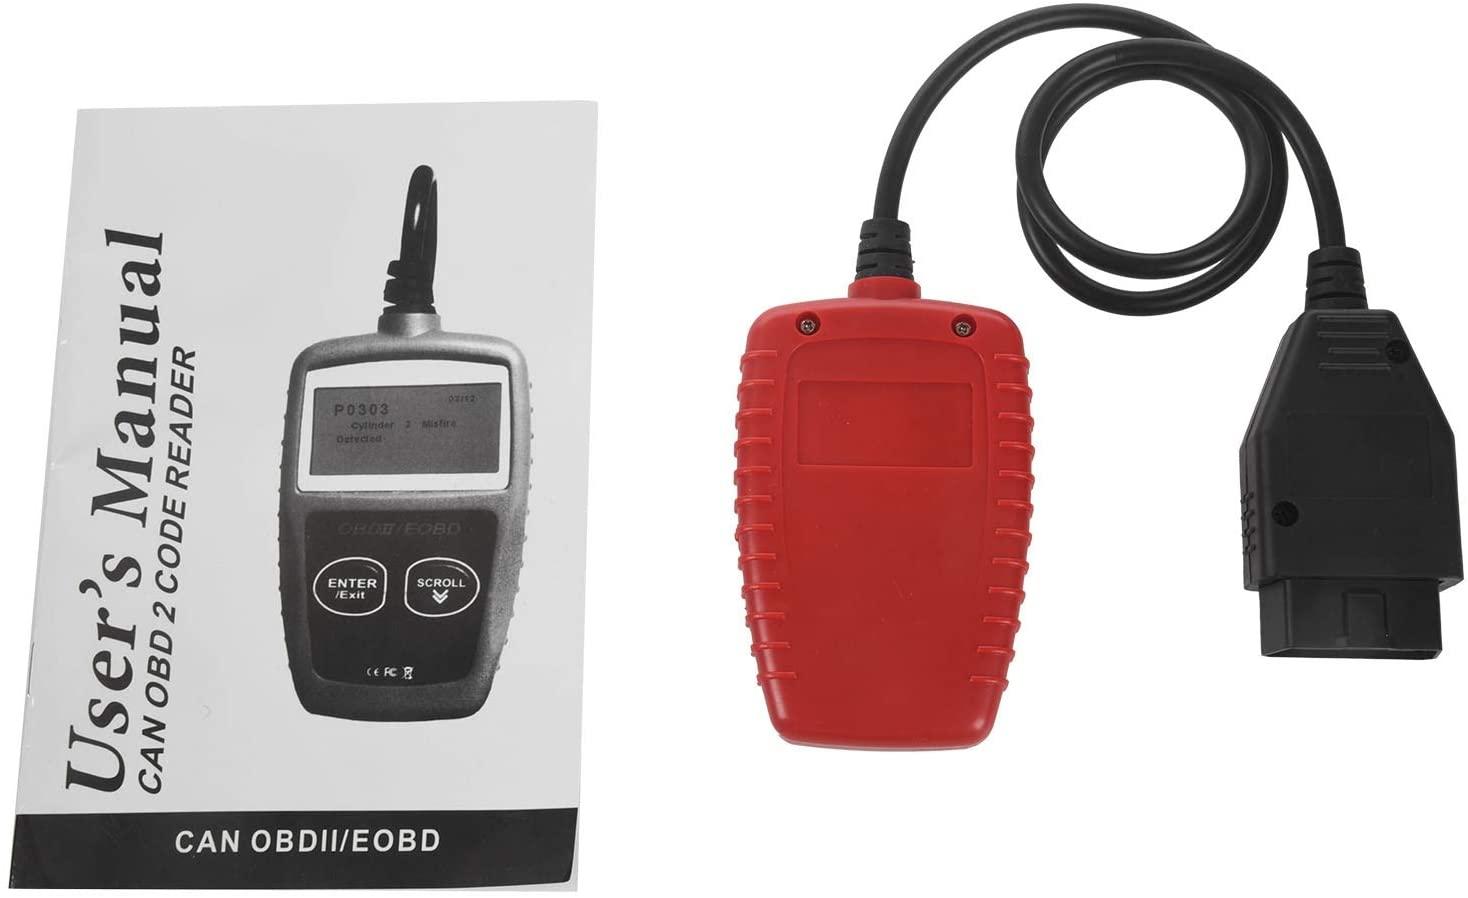 RETYLY MS309 OBD 2 Scanner